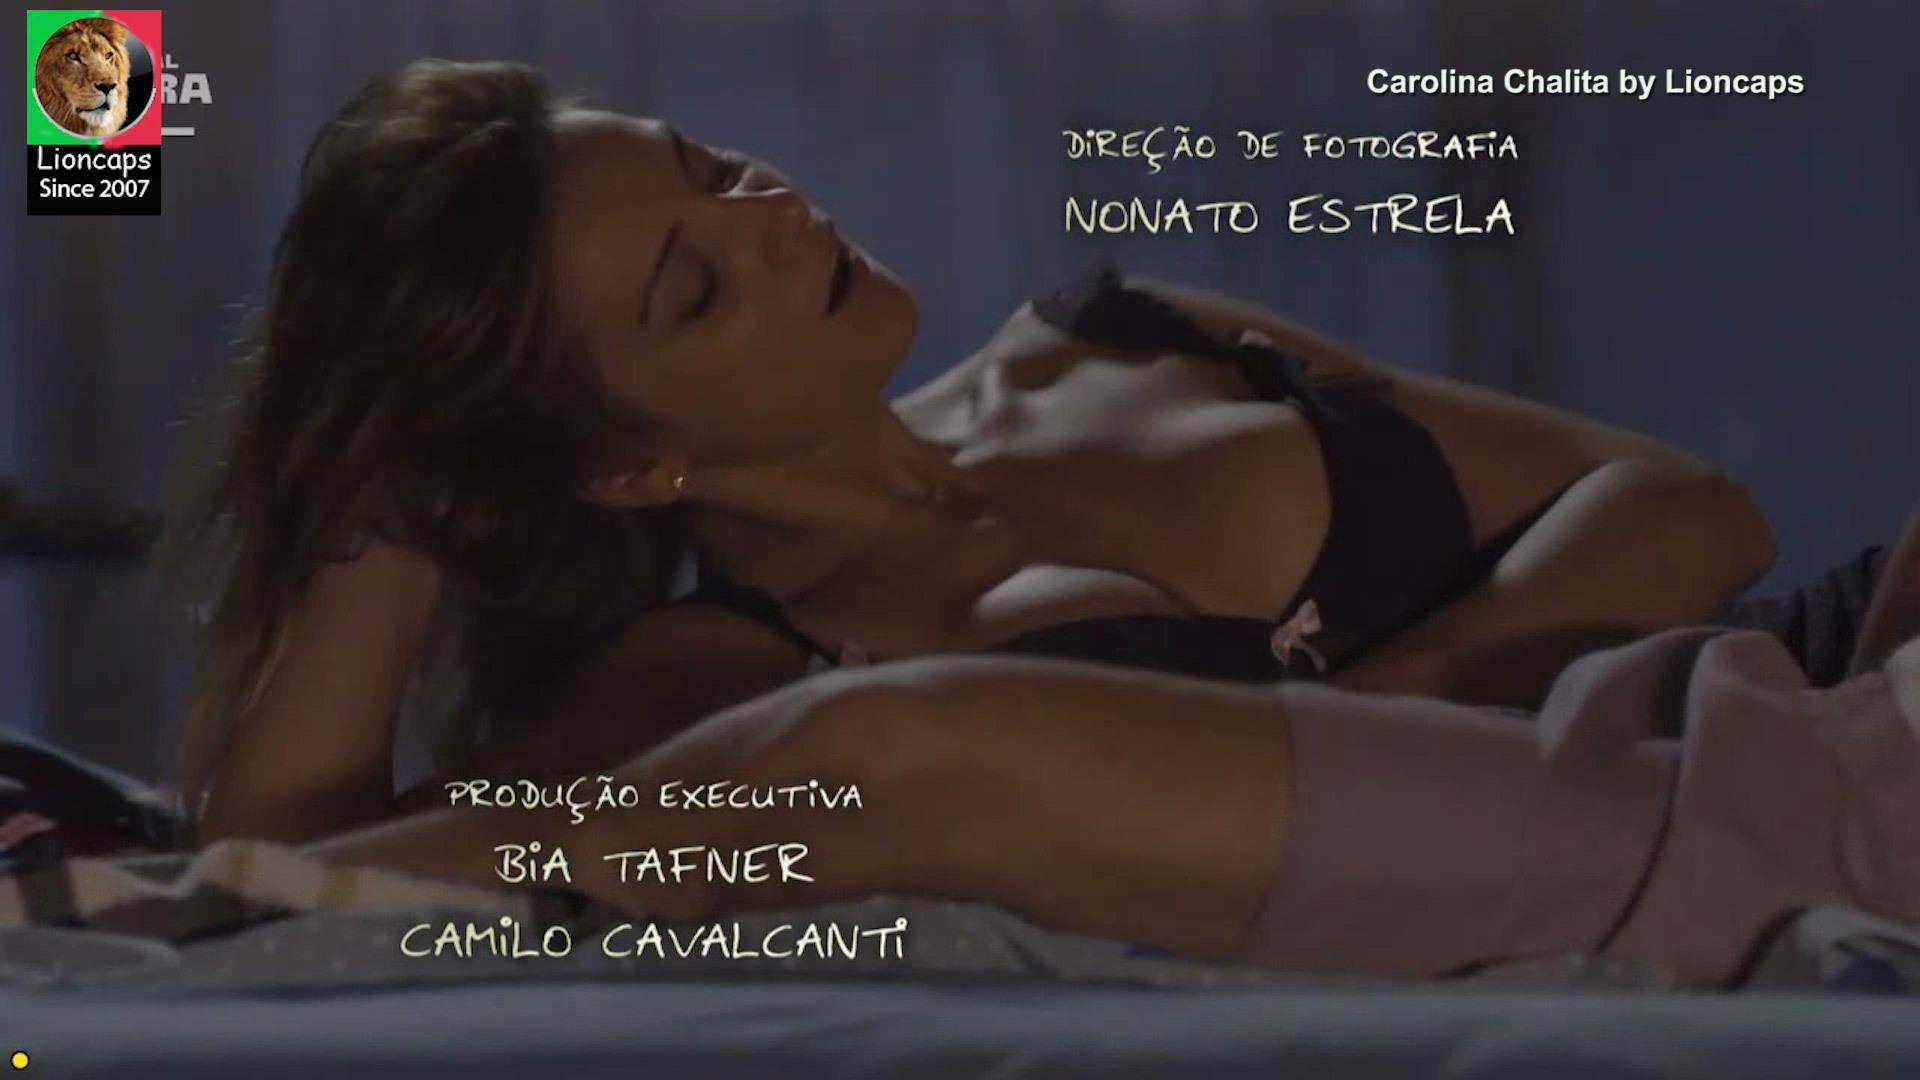 carolina_chalita_amor_4_1_lioncaps_25_04_2021 (10).jpg